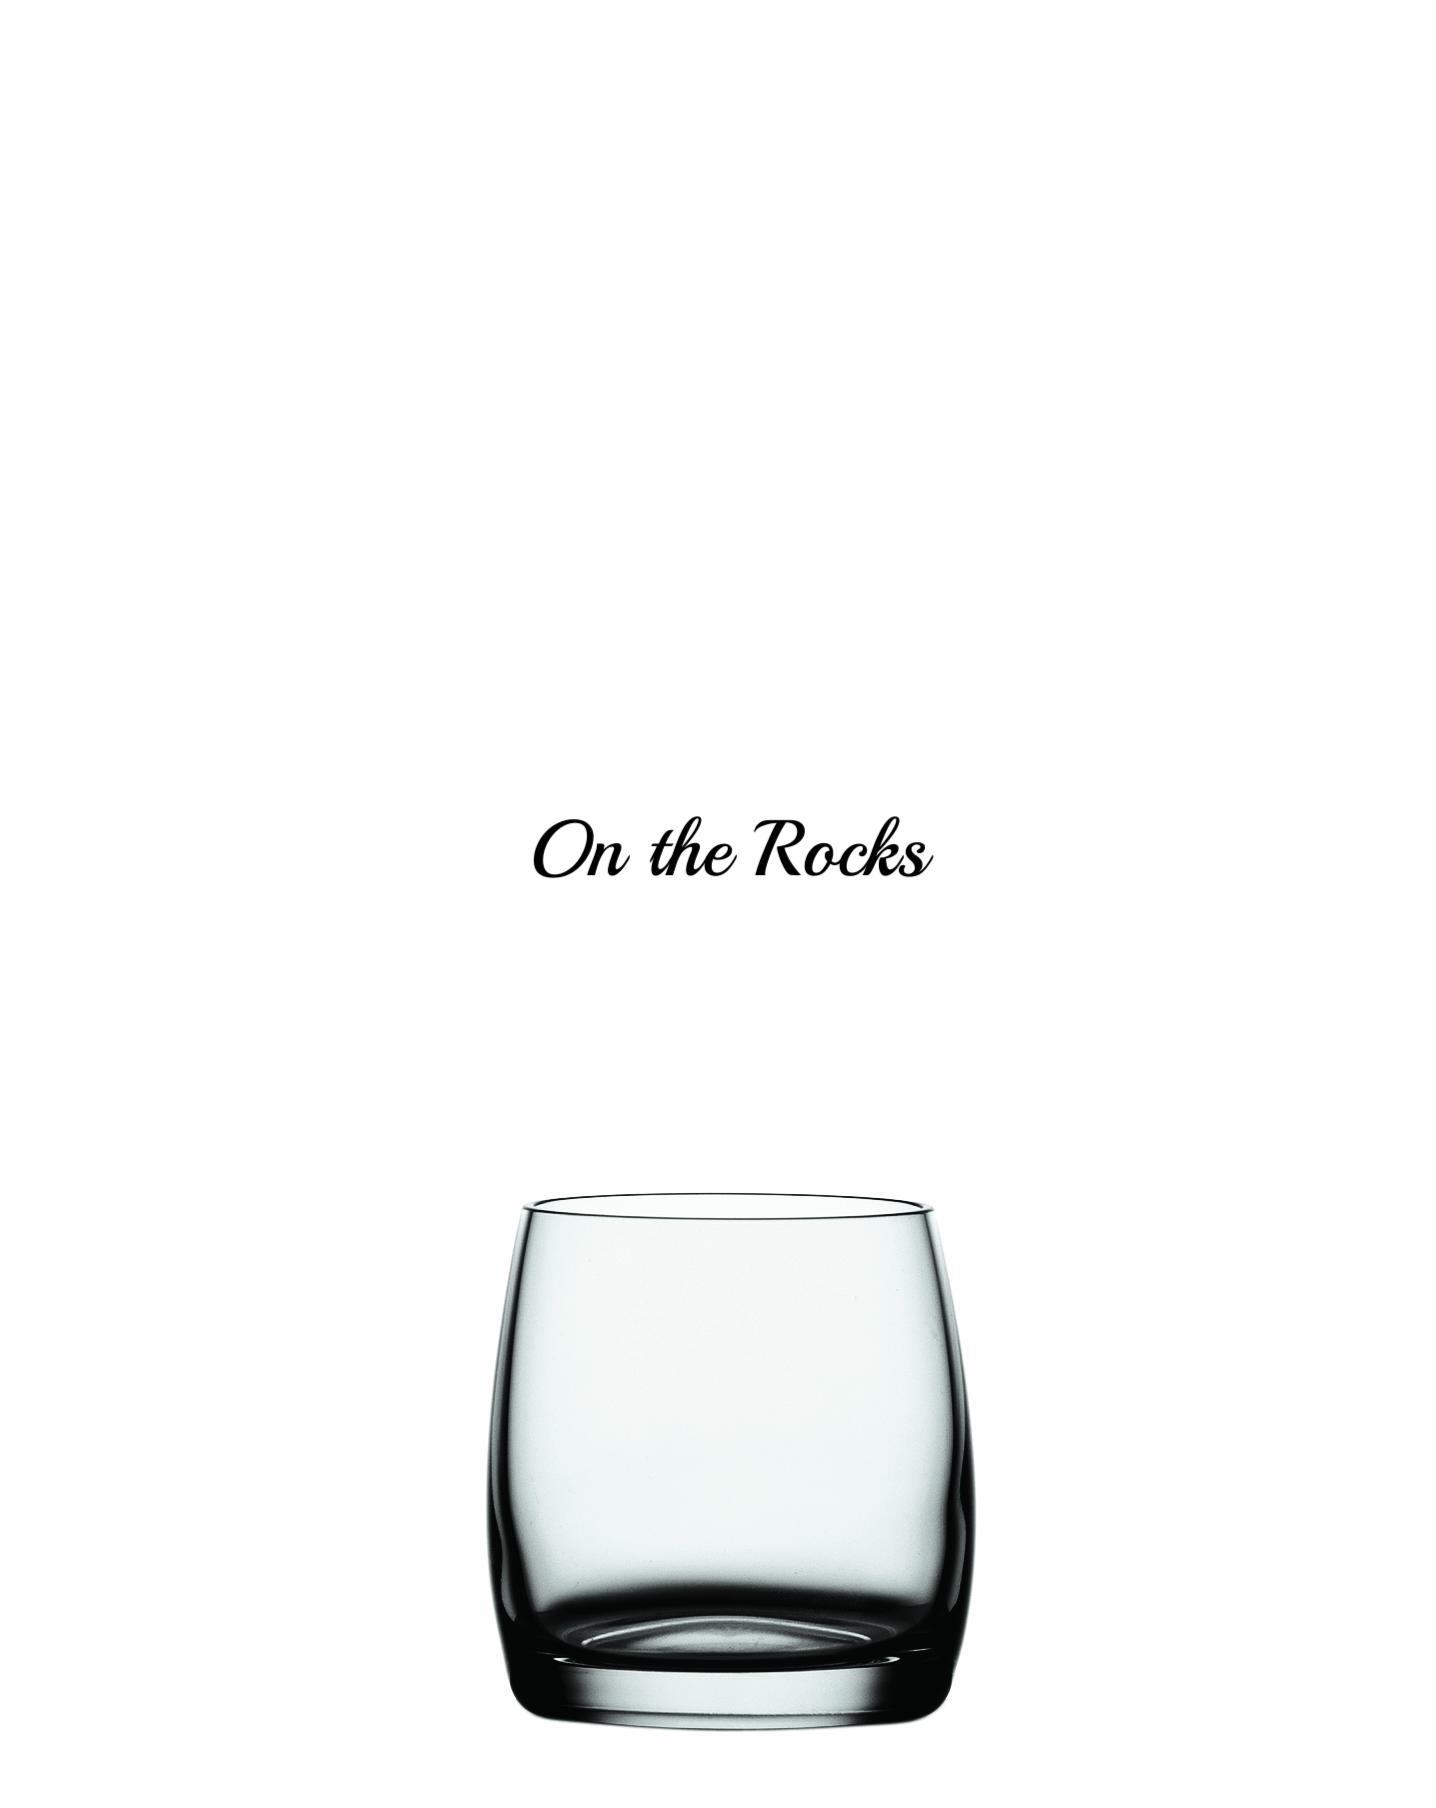 On the Rocks 4510276.jpg